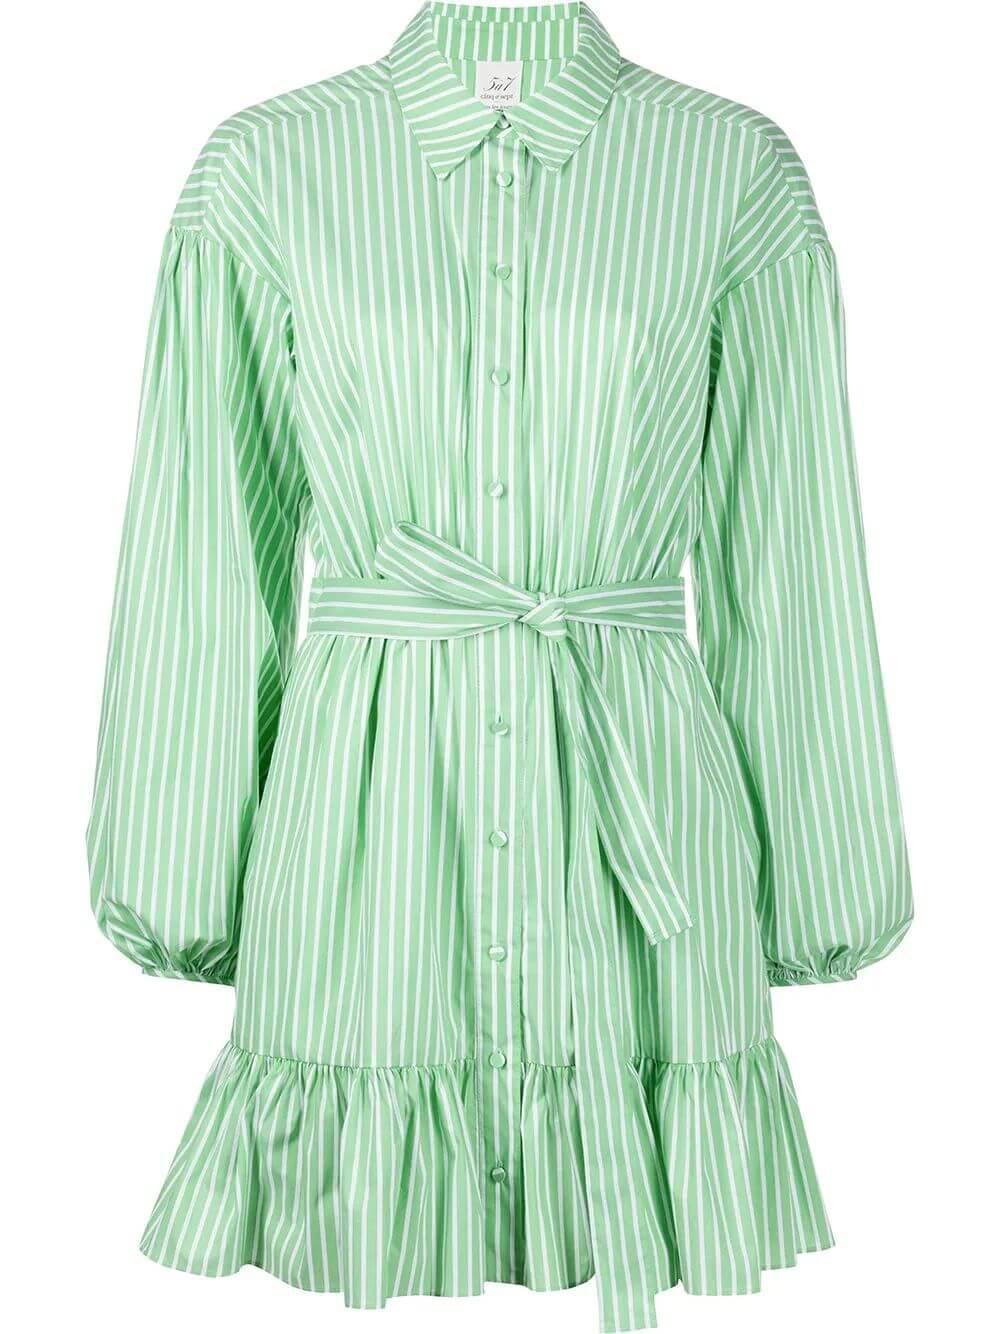 Kelly Striped Dress Item # ZD12683939Z